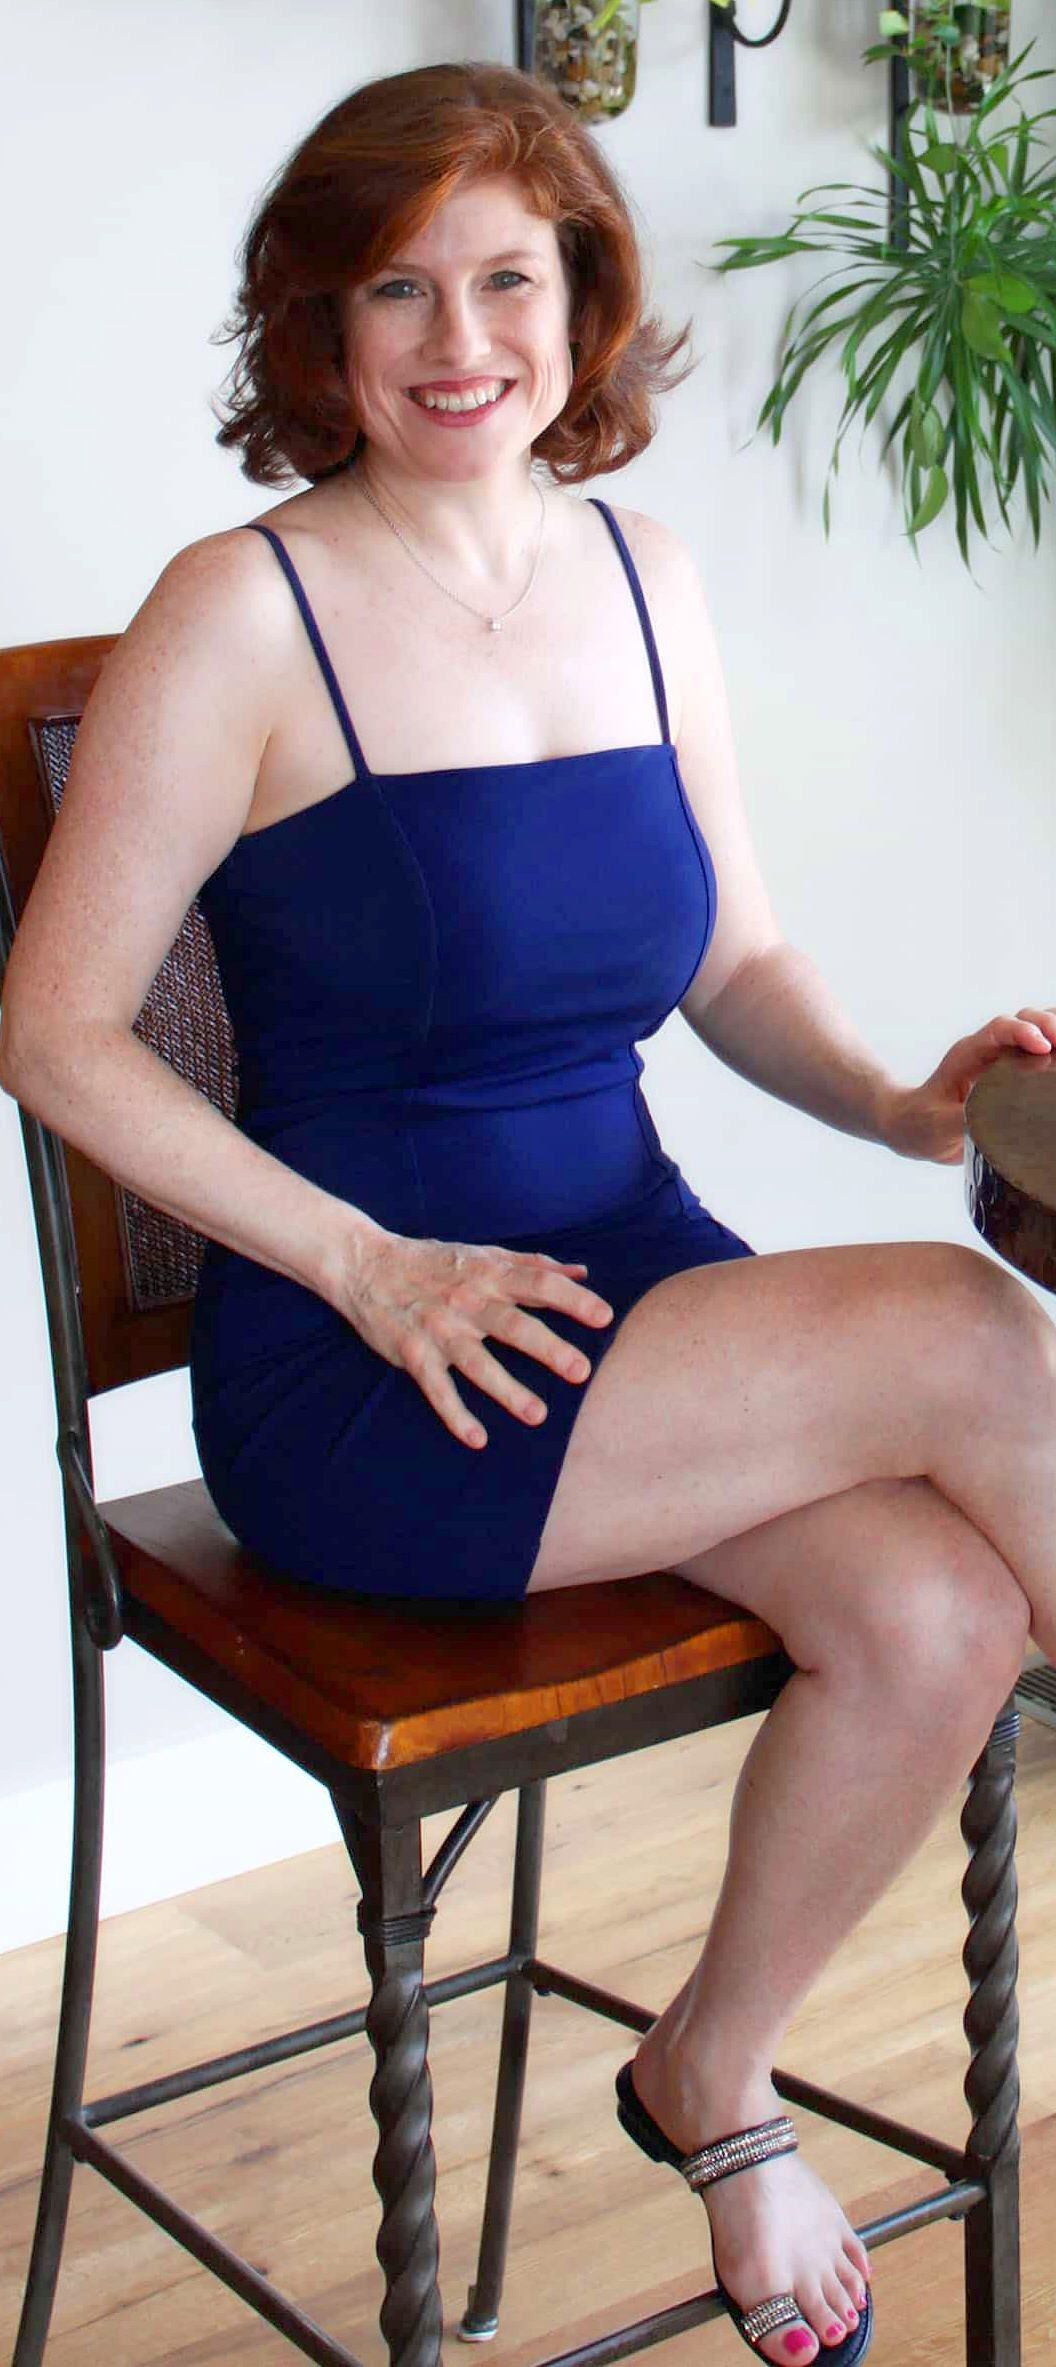 Cute non nude mature women galleries — photo 14